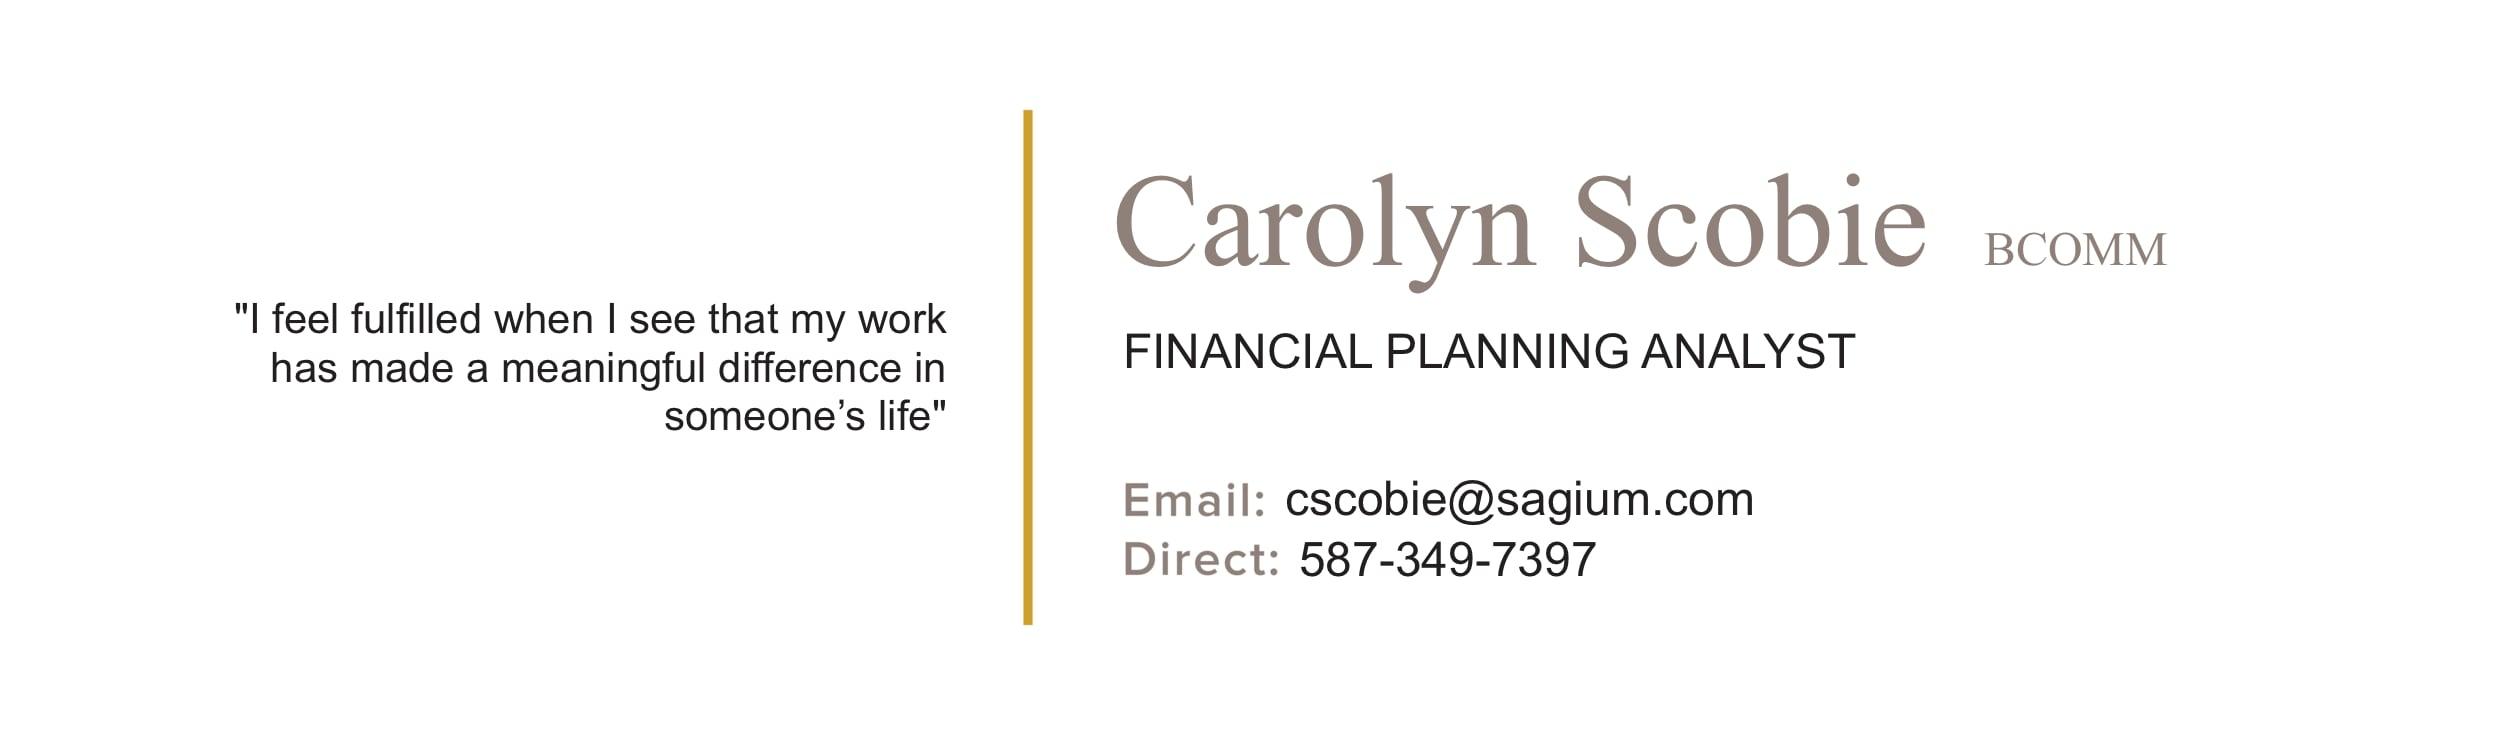 carolyn-scobie-card.jpg